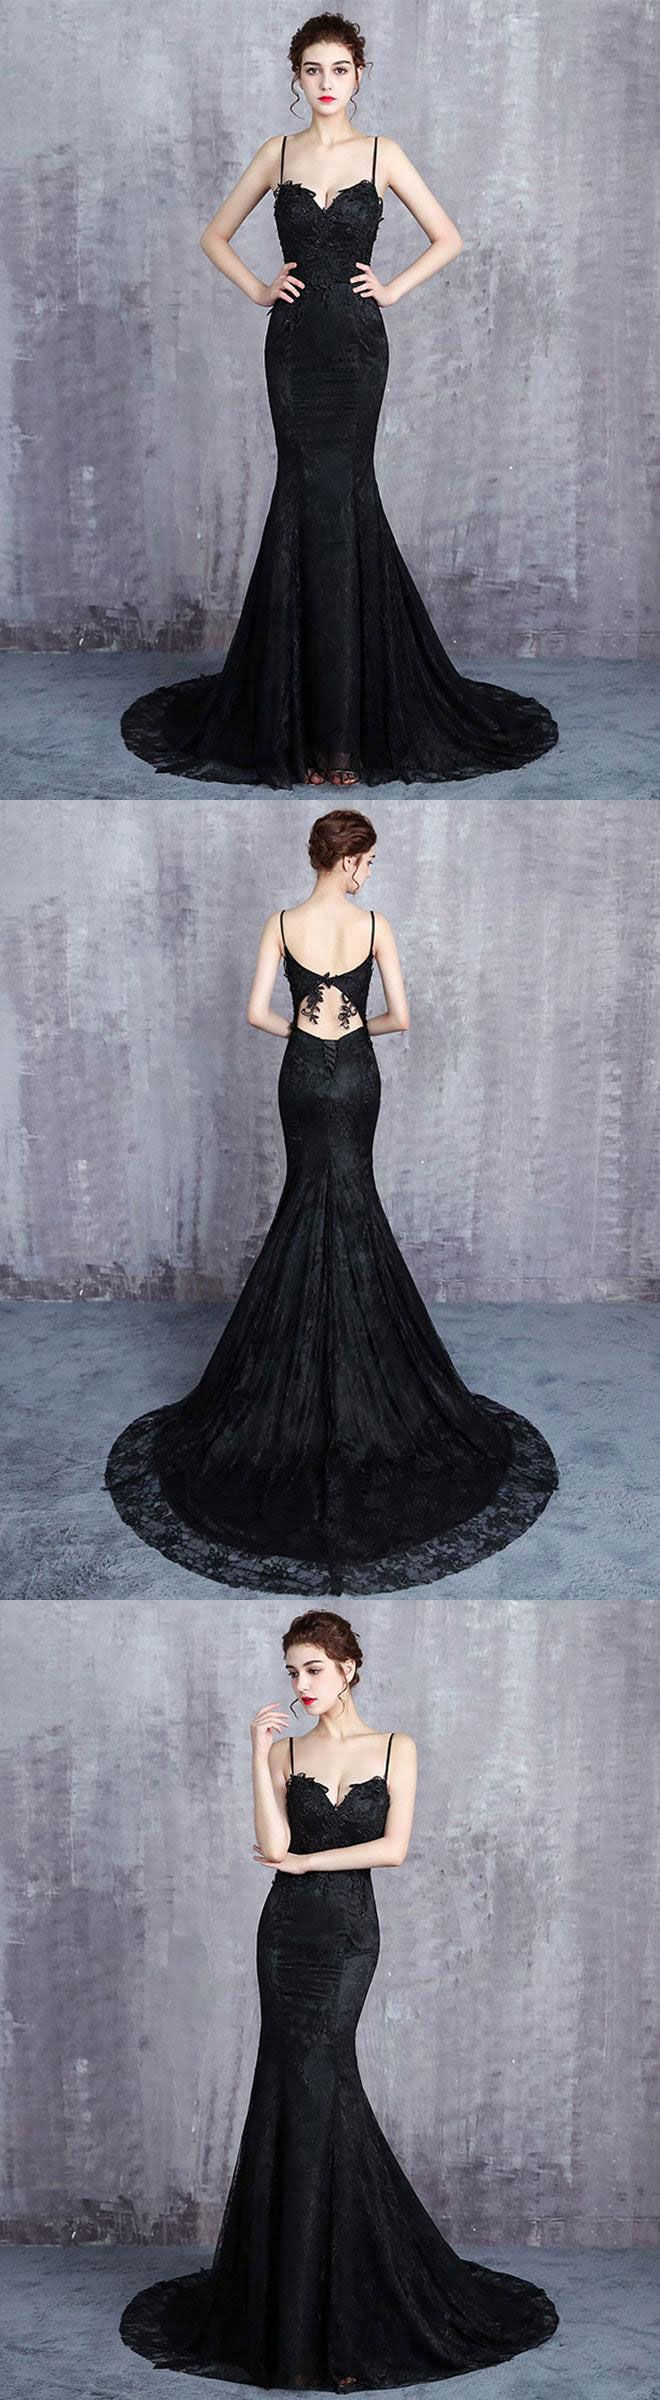 Black lace long prom dress mermaid evening dress wedding gothic